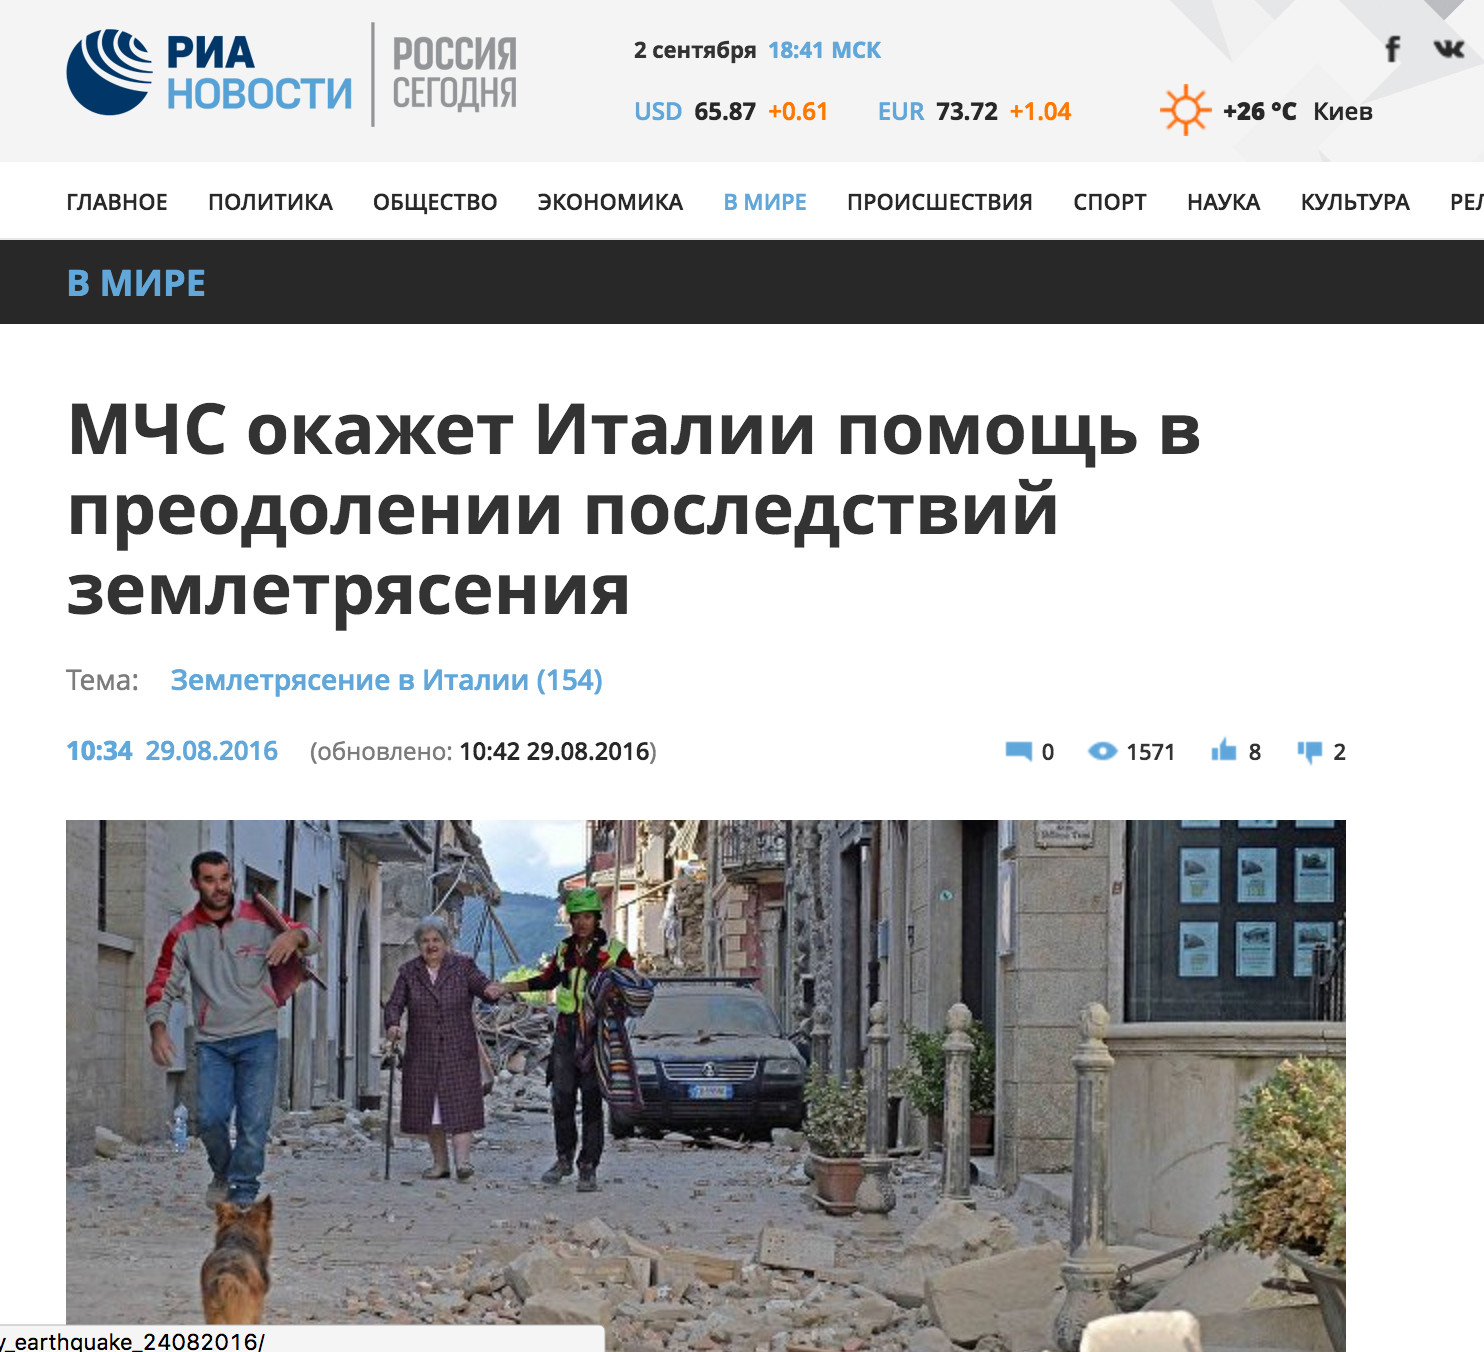 """El Ministerio de emegrencias va a ayudar a Italia recuperarse después del terremoto"", tass.ru"